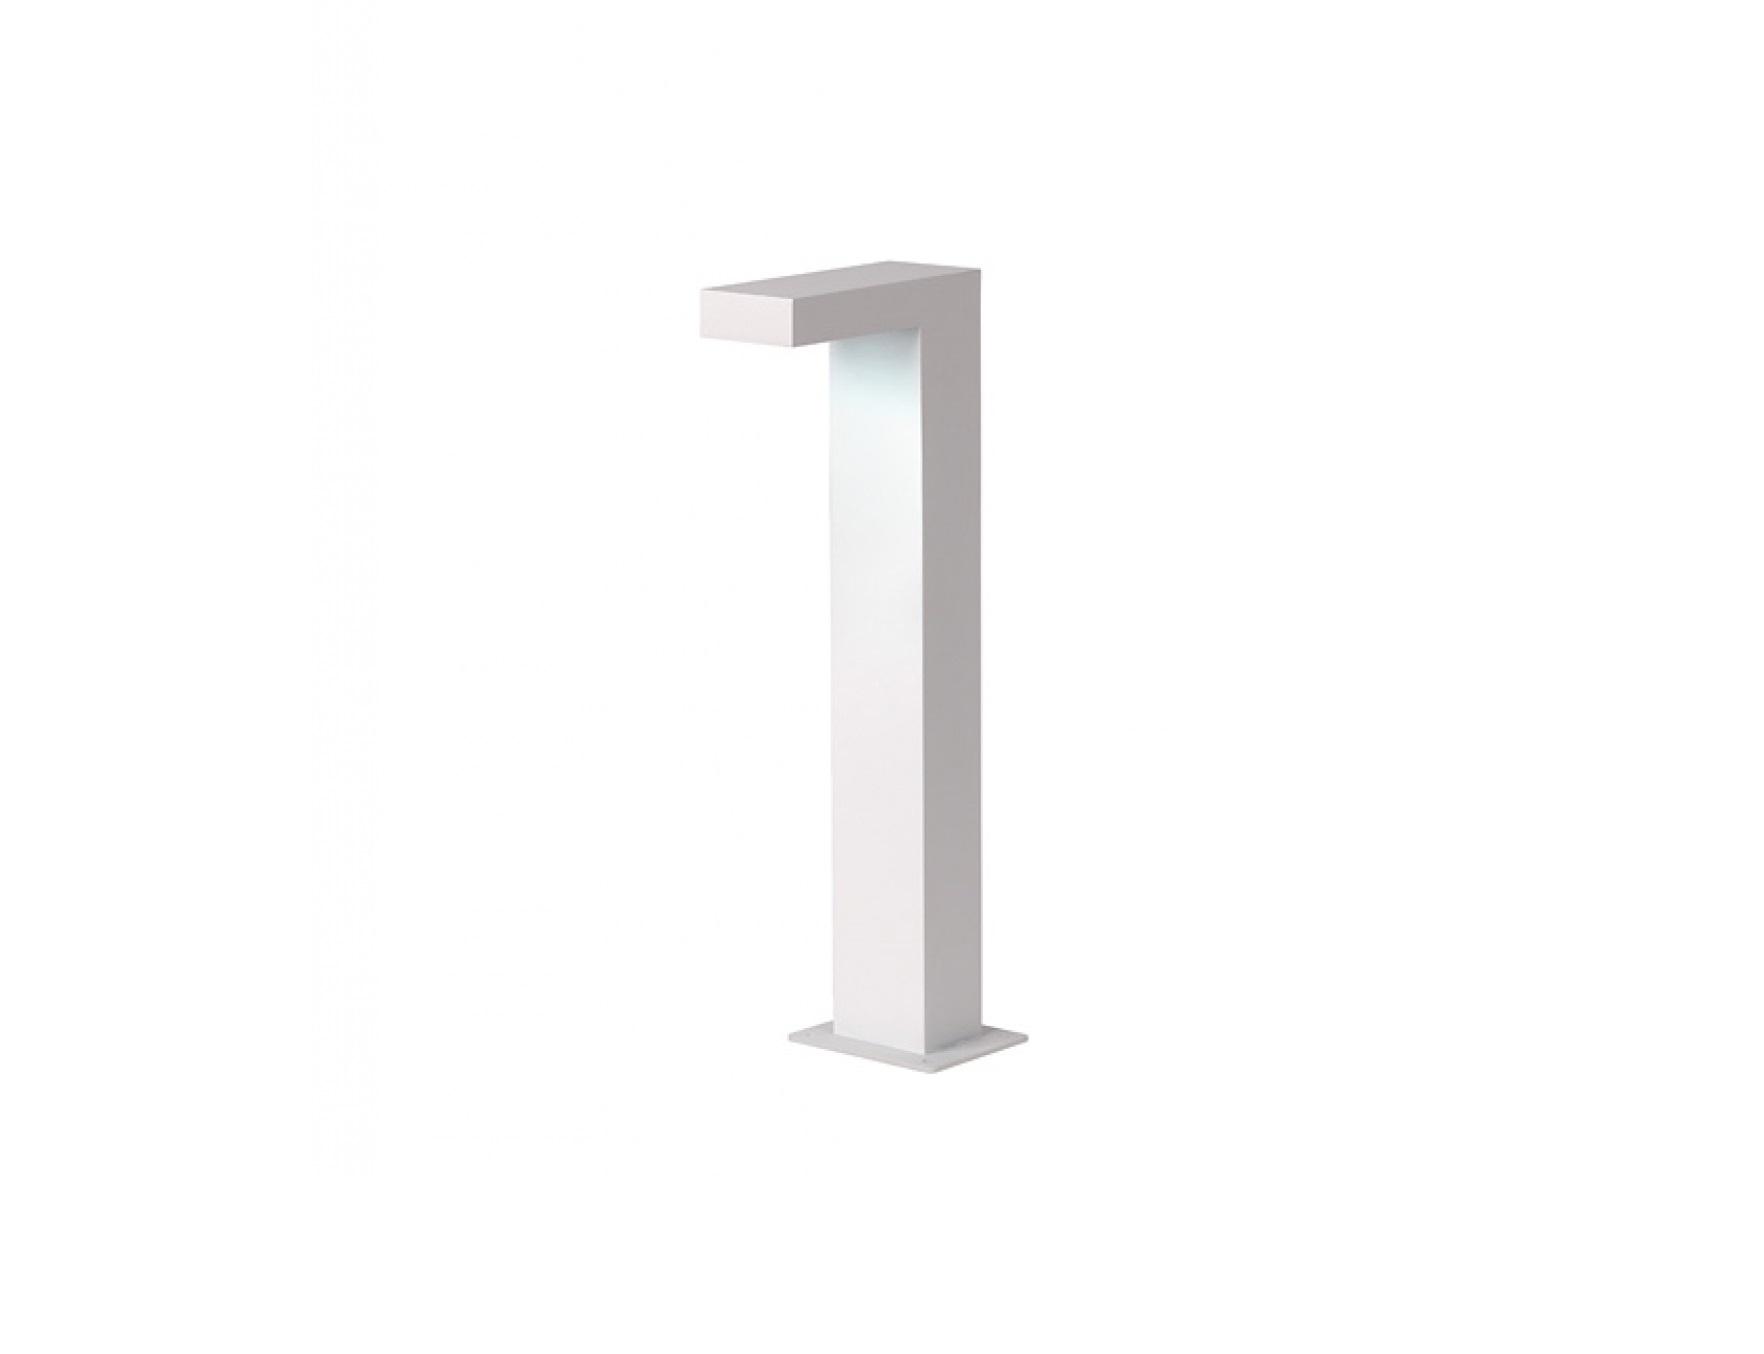 Столб TEXASУличные наземные светильники<br>&amp;lt;span style=&amp;quot;line-height: 24.9999px;&amp;quot;&amp;gt;Цоколь LED,&amp;amp;nbsp;&amp;lt;/span&amp;gt;&amp;lt;div style=&amp;quot;line-height: 24.9999px;&amp;quot;&amp;gt;Мощность 6W,&amp;amp;nbsp;&amp;lt;/div&amp;gt;&amp;lt;div style=&amp;quot;line-height: 24.9999px;&amp;quot;&amp;gt;Количество 1 лампочка (в комплекте)&amp;lt;/div&amp;gt;<br><br>Material: Металл<br>Width см: 17<br>Depth см: 6<br>Height см: 40